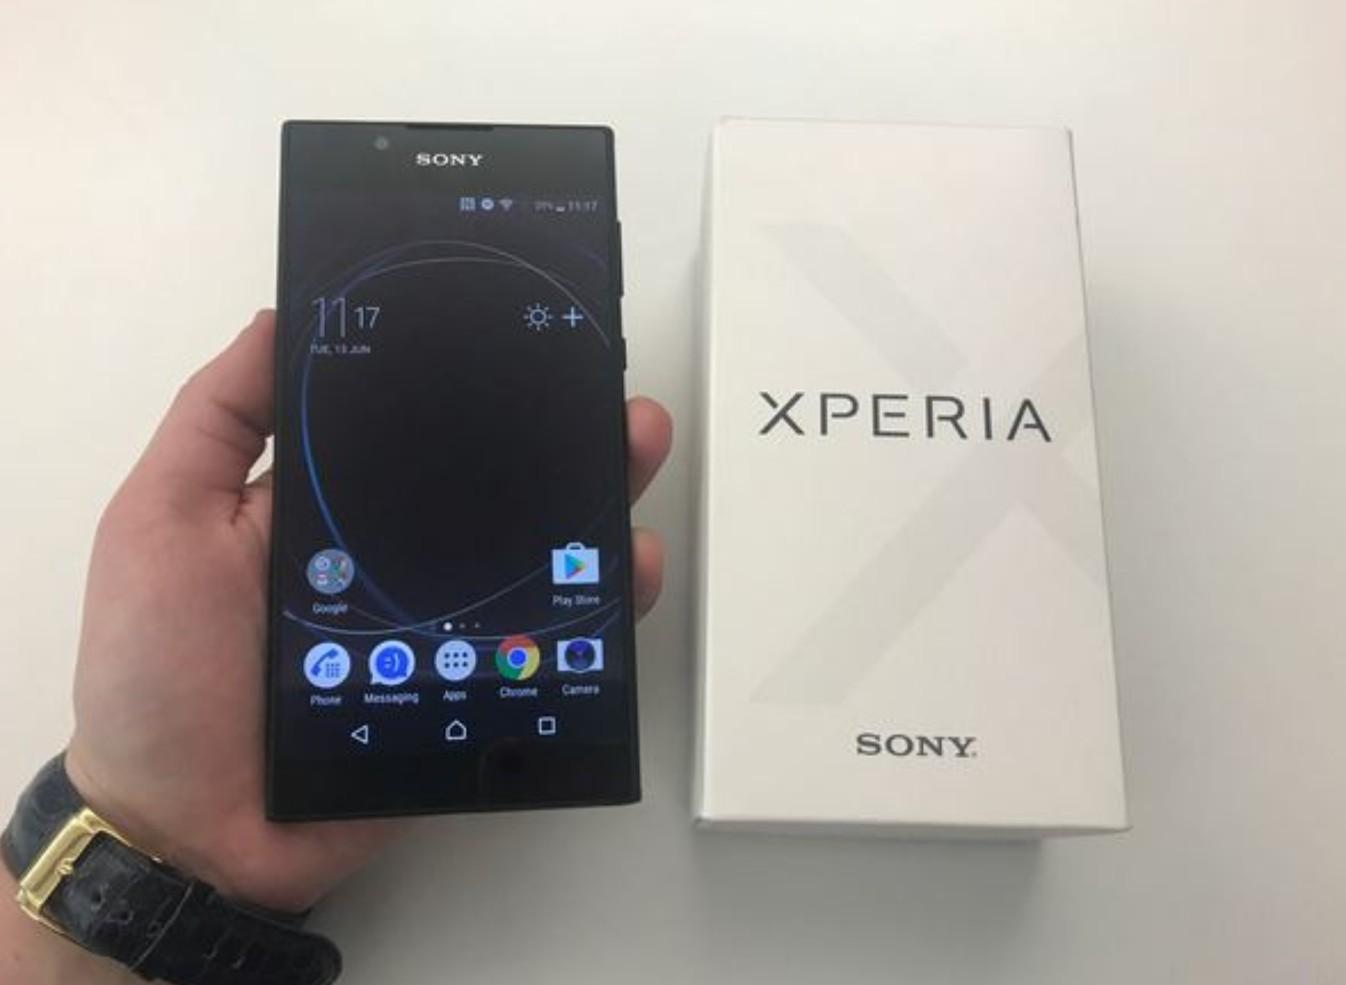 MobilExperten: Sony Xperia L1. Bra budgetmobil i större ...